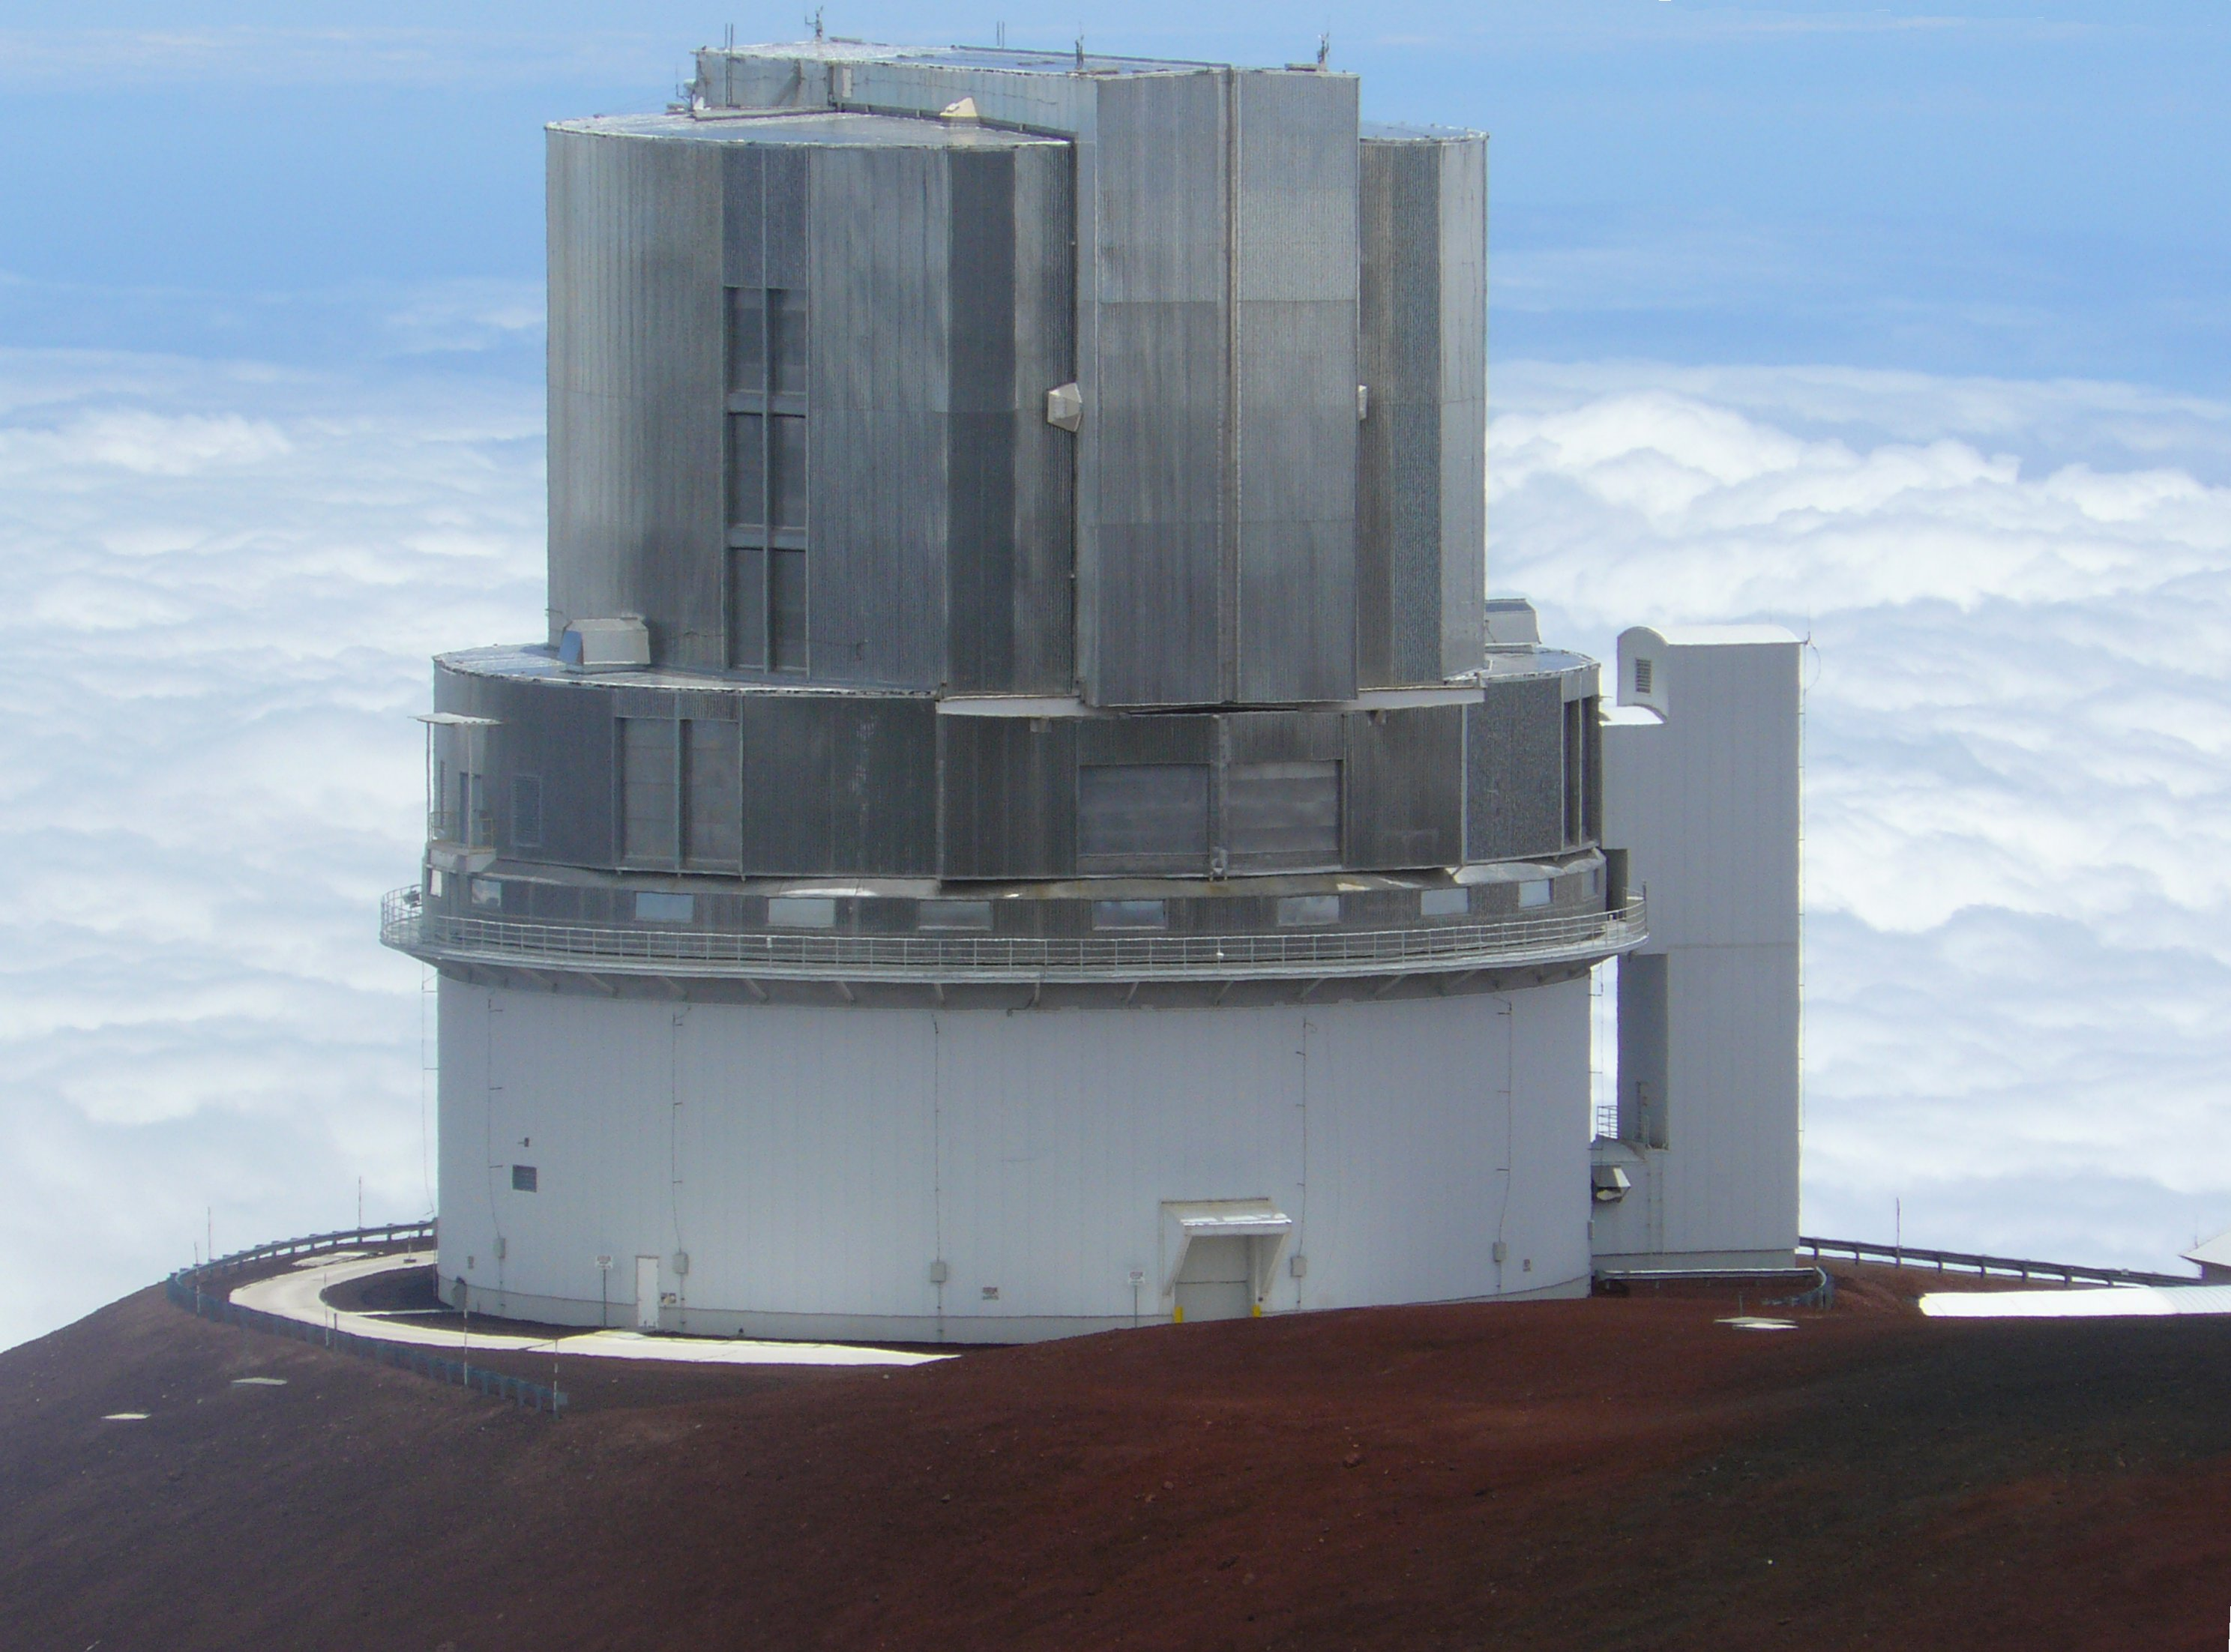 The Subaru Telescope on Mauna Kea, Hawai'i. Image credit wikimedia user Denys, CC BY 3.0.